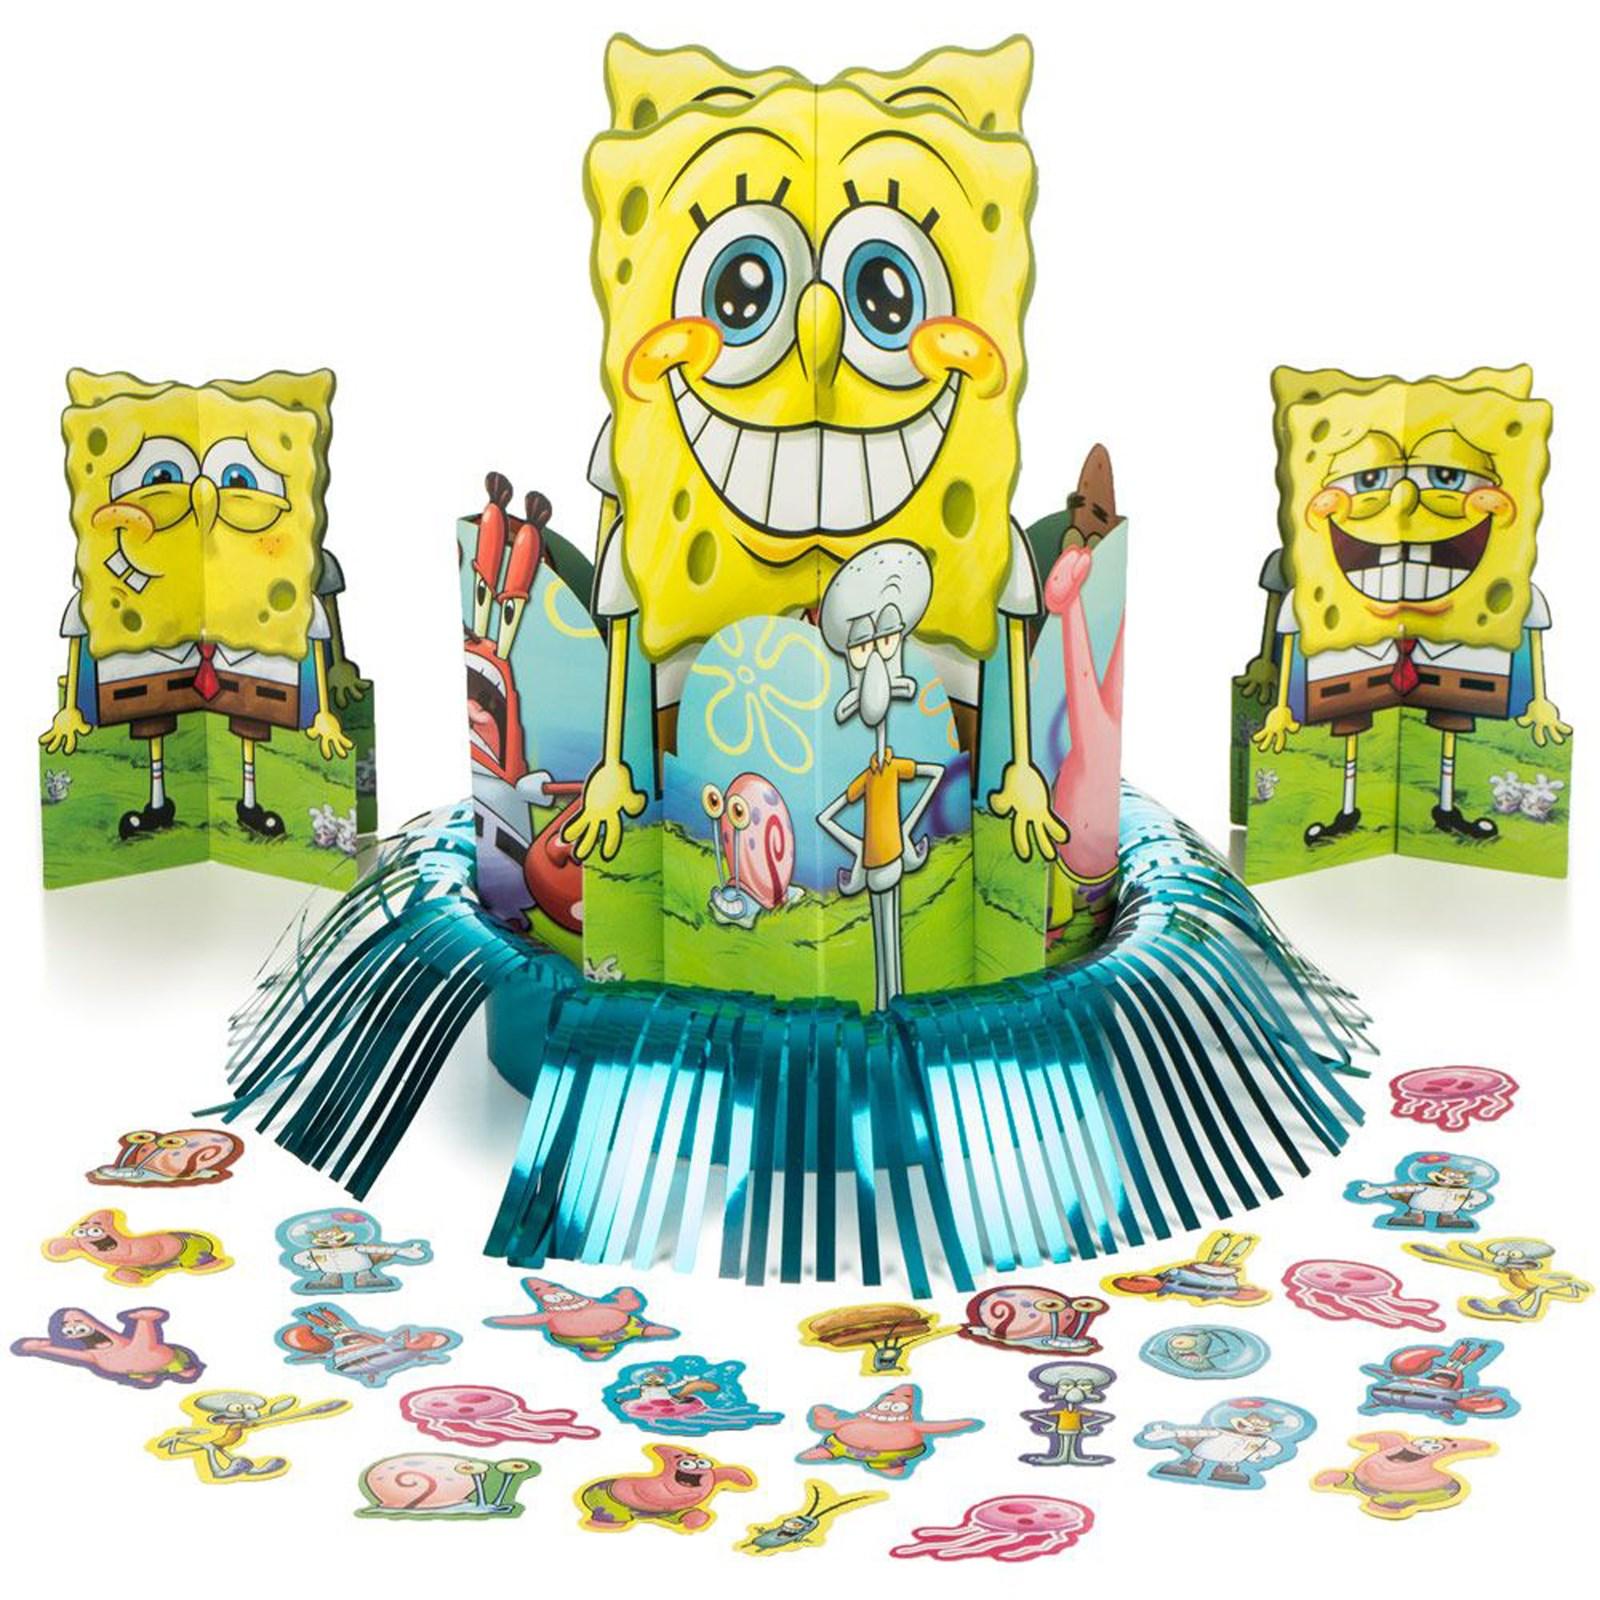 Abby Cadabby Party Decorations Spongebob Squarepants Party Supplies Birthdayexpresscom